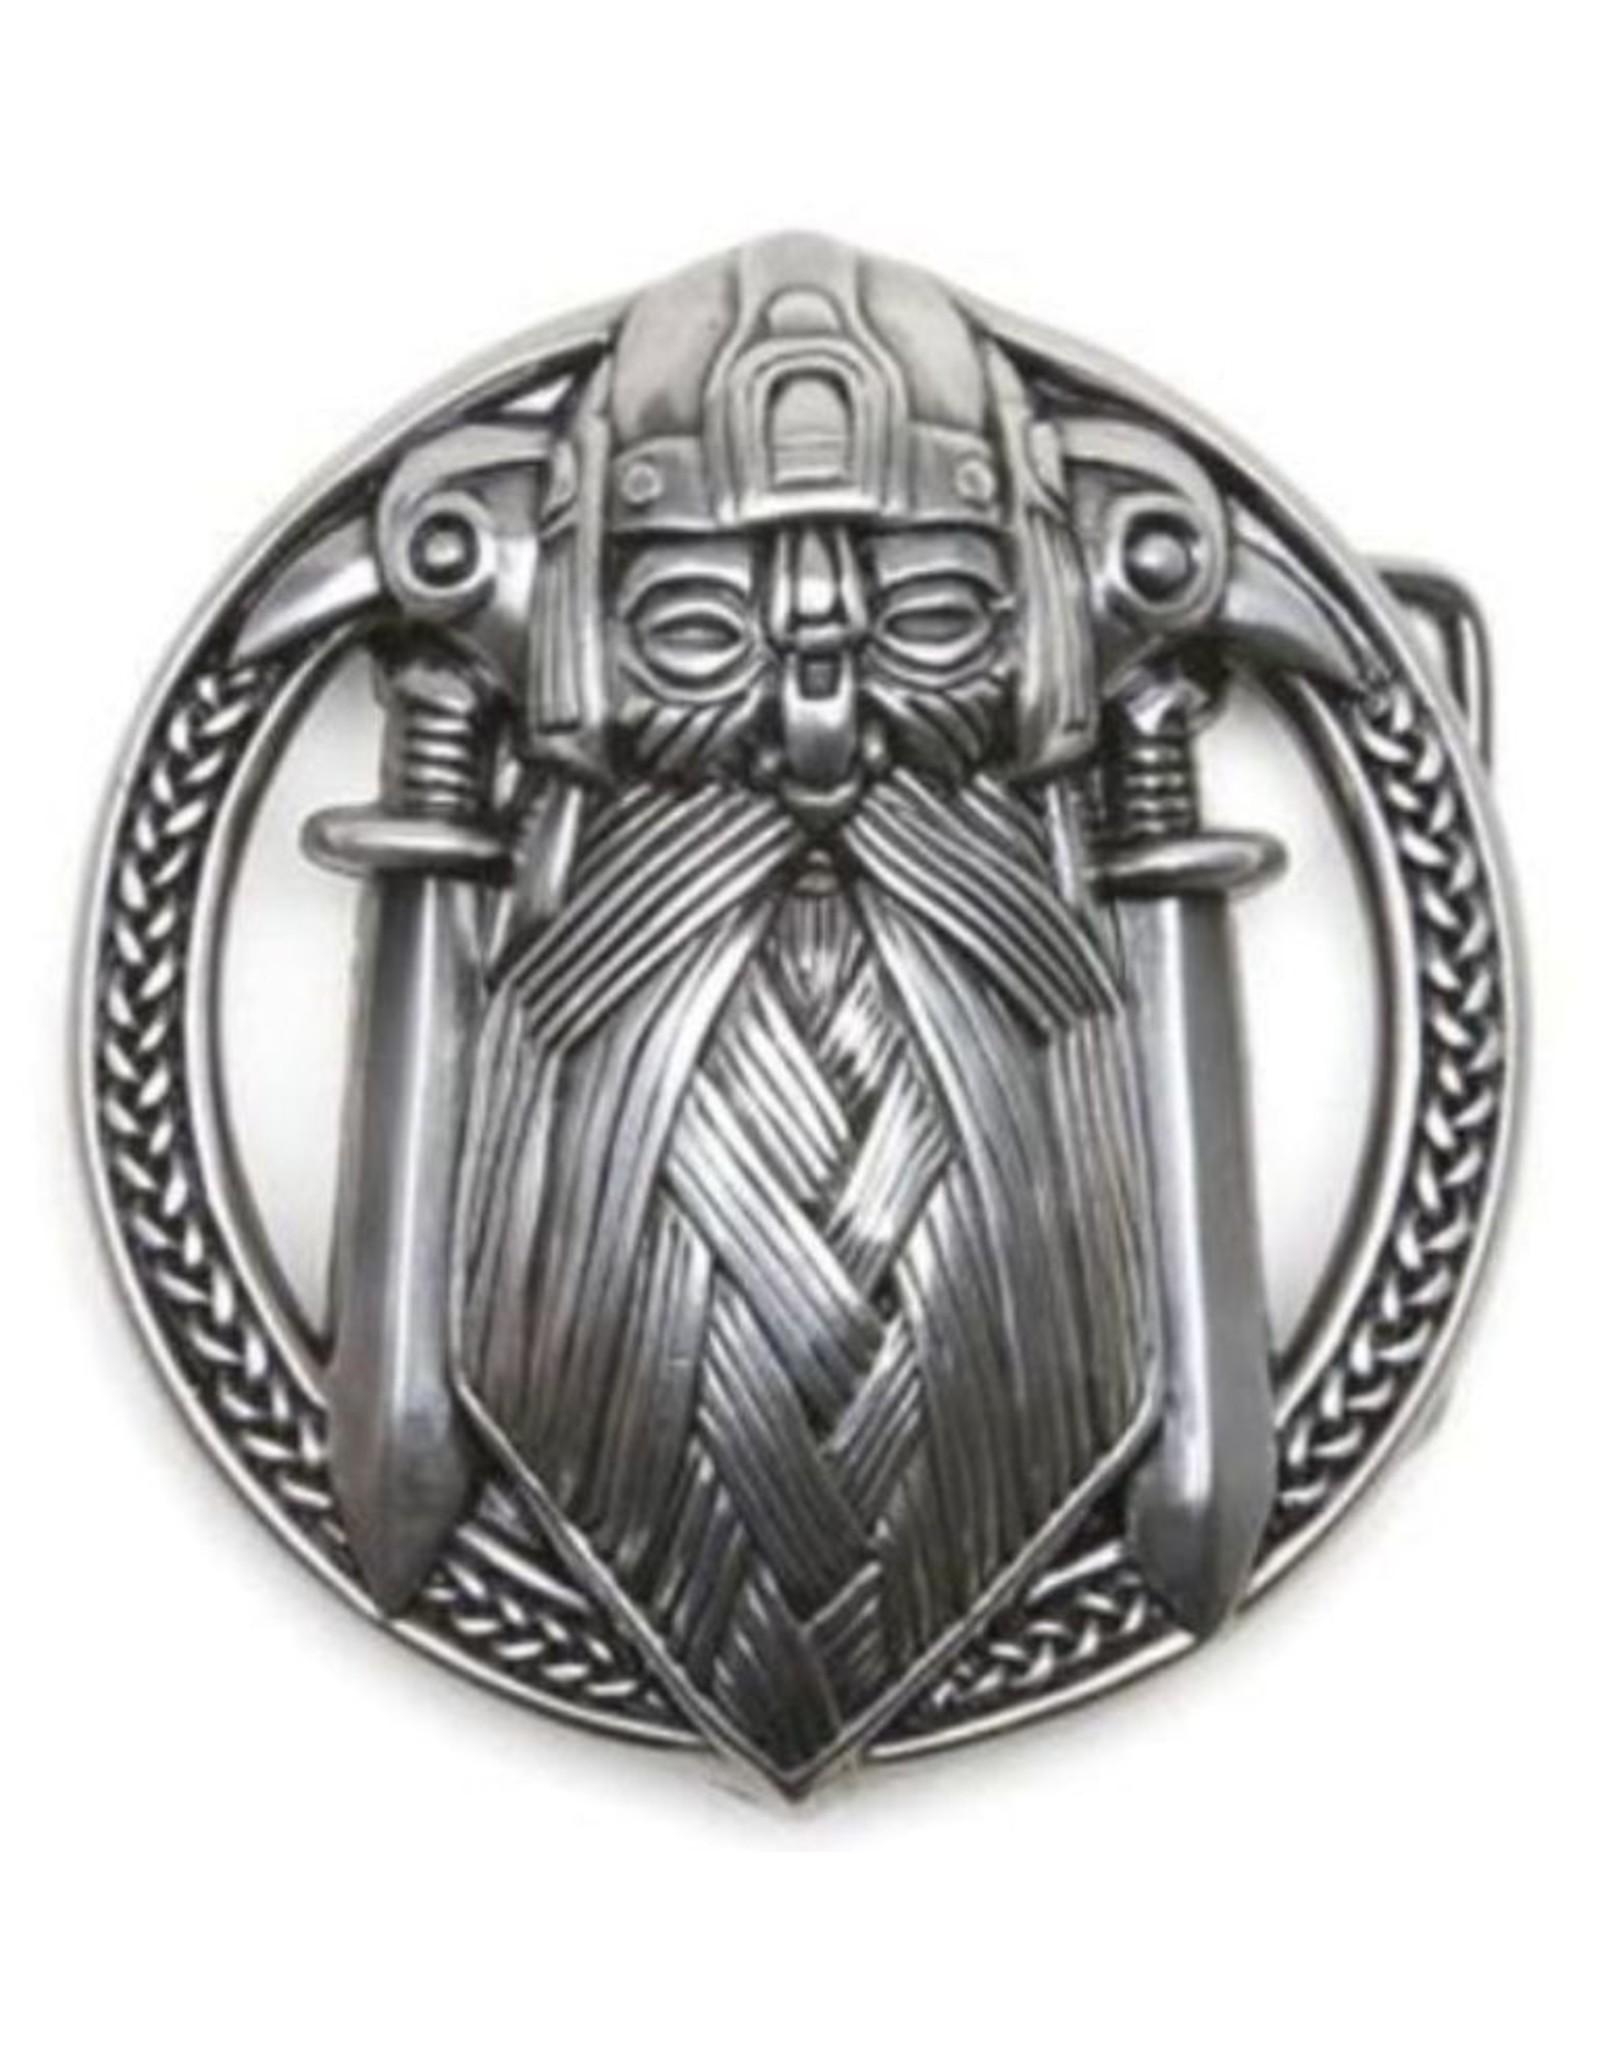 Acco Buckles - Buckle Viking - massief metaal